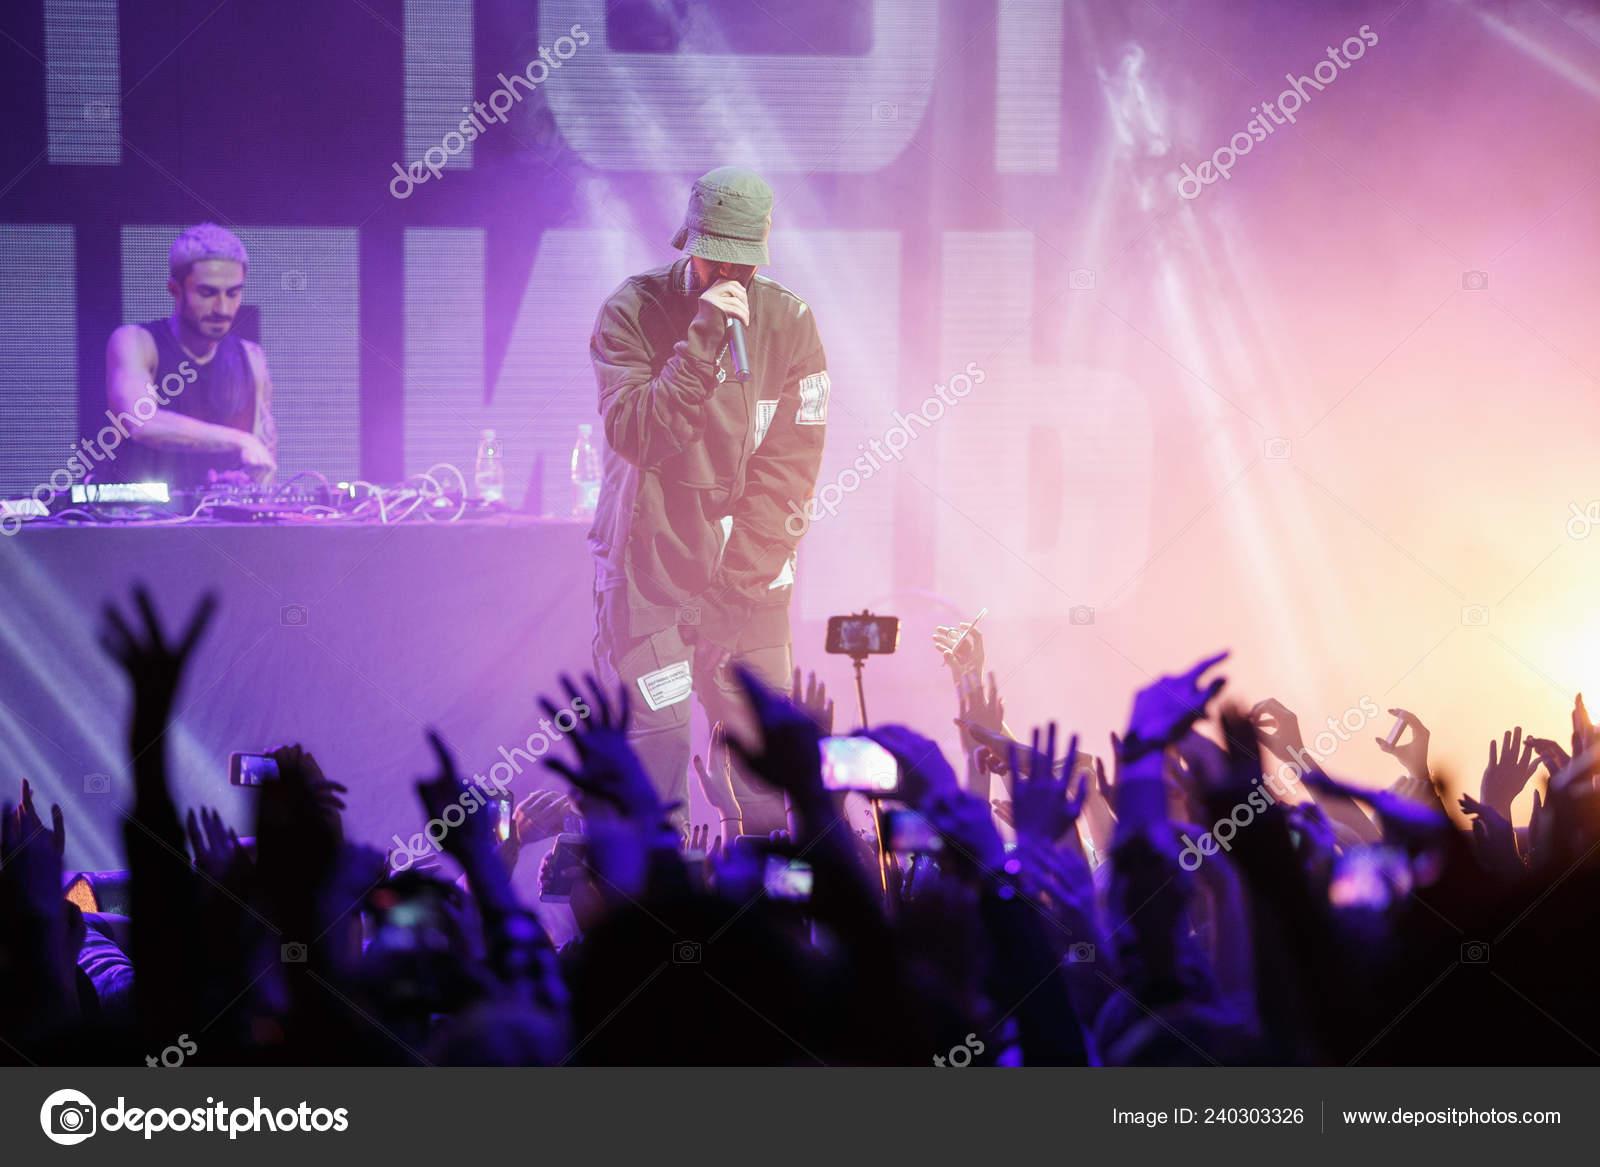 Moscow February 2017 Big Hip Hop Music Festival Night Club